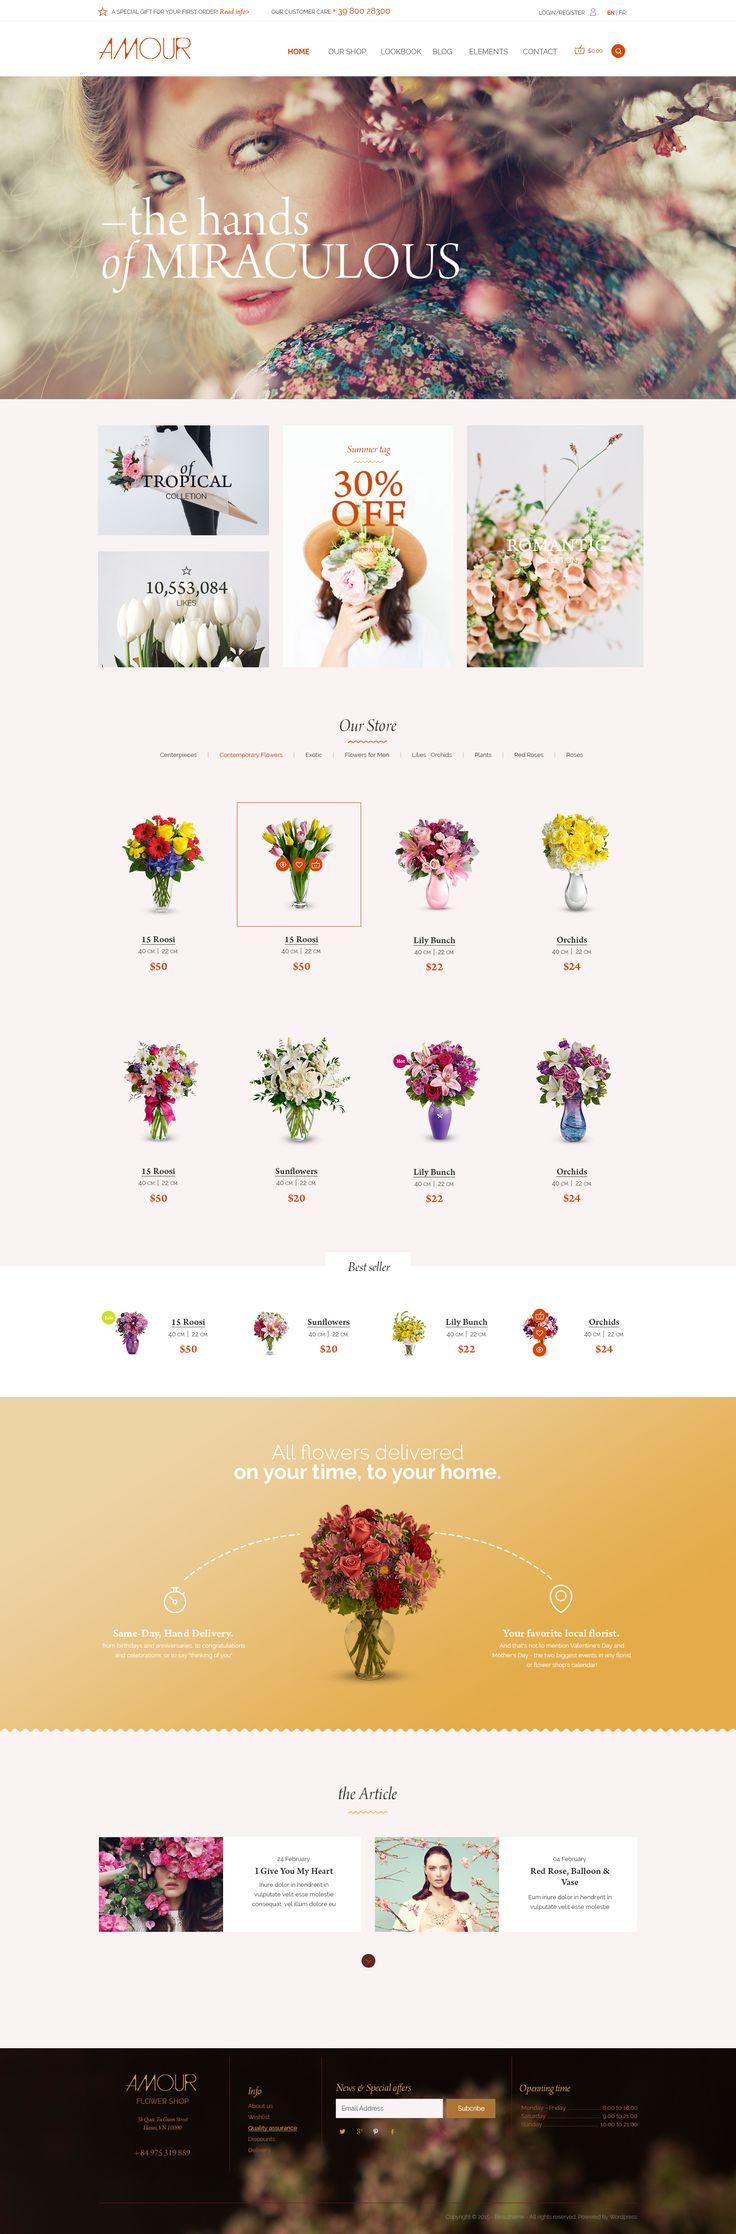 1 flower shop